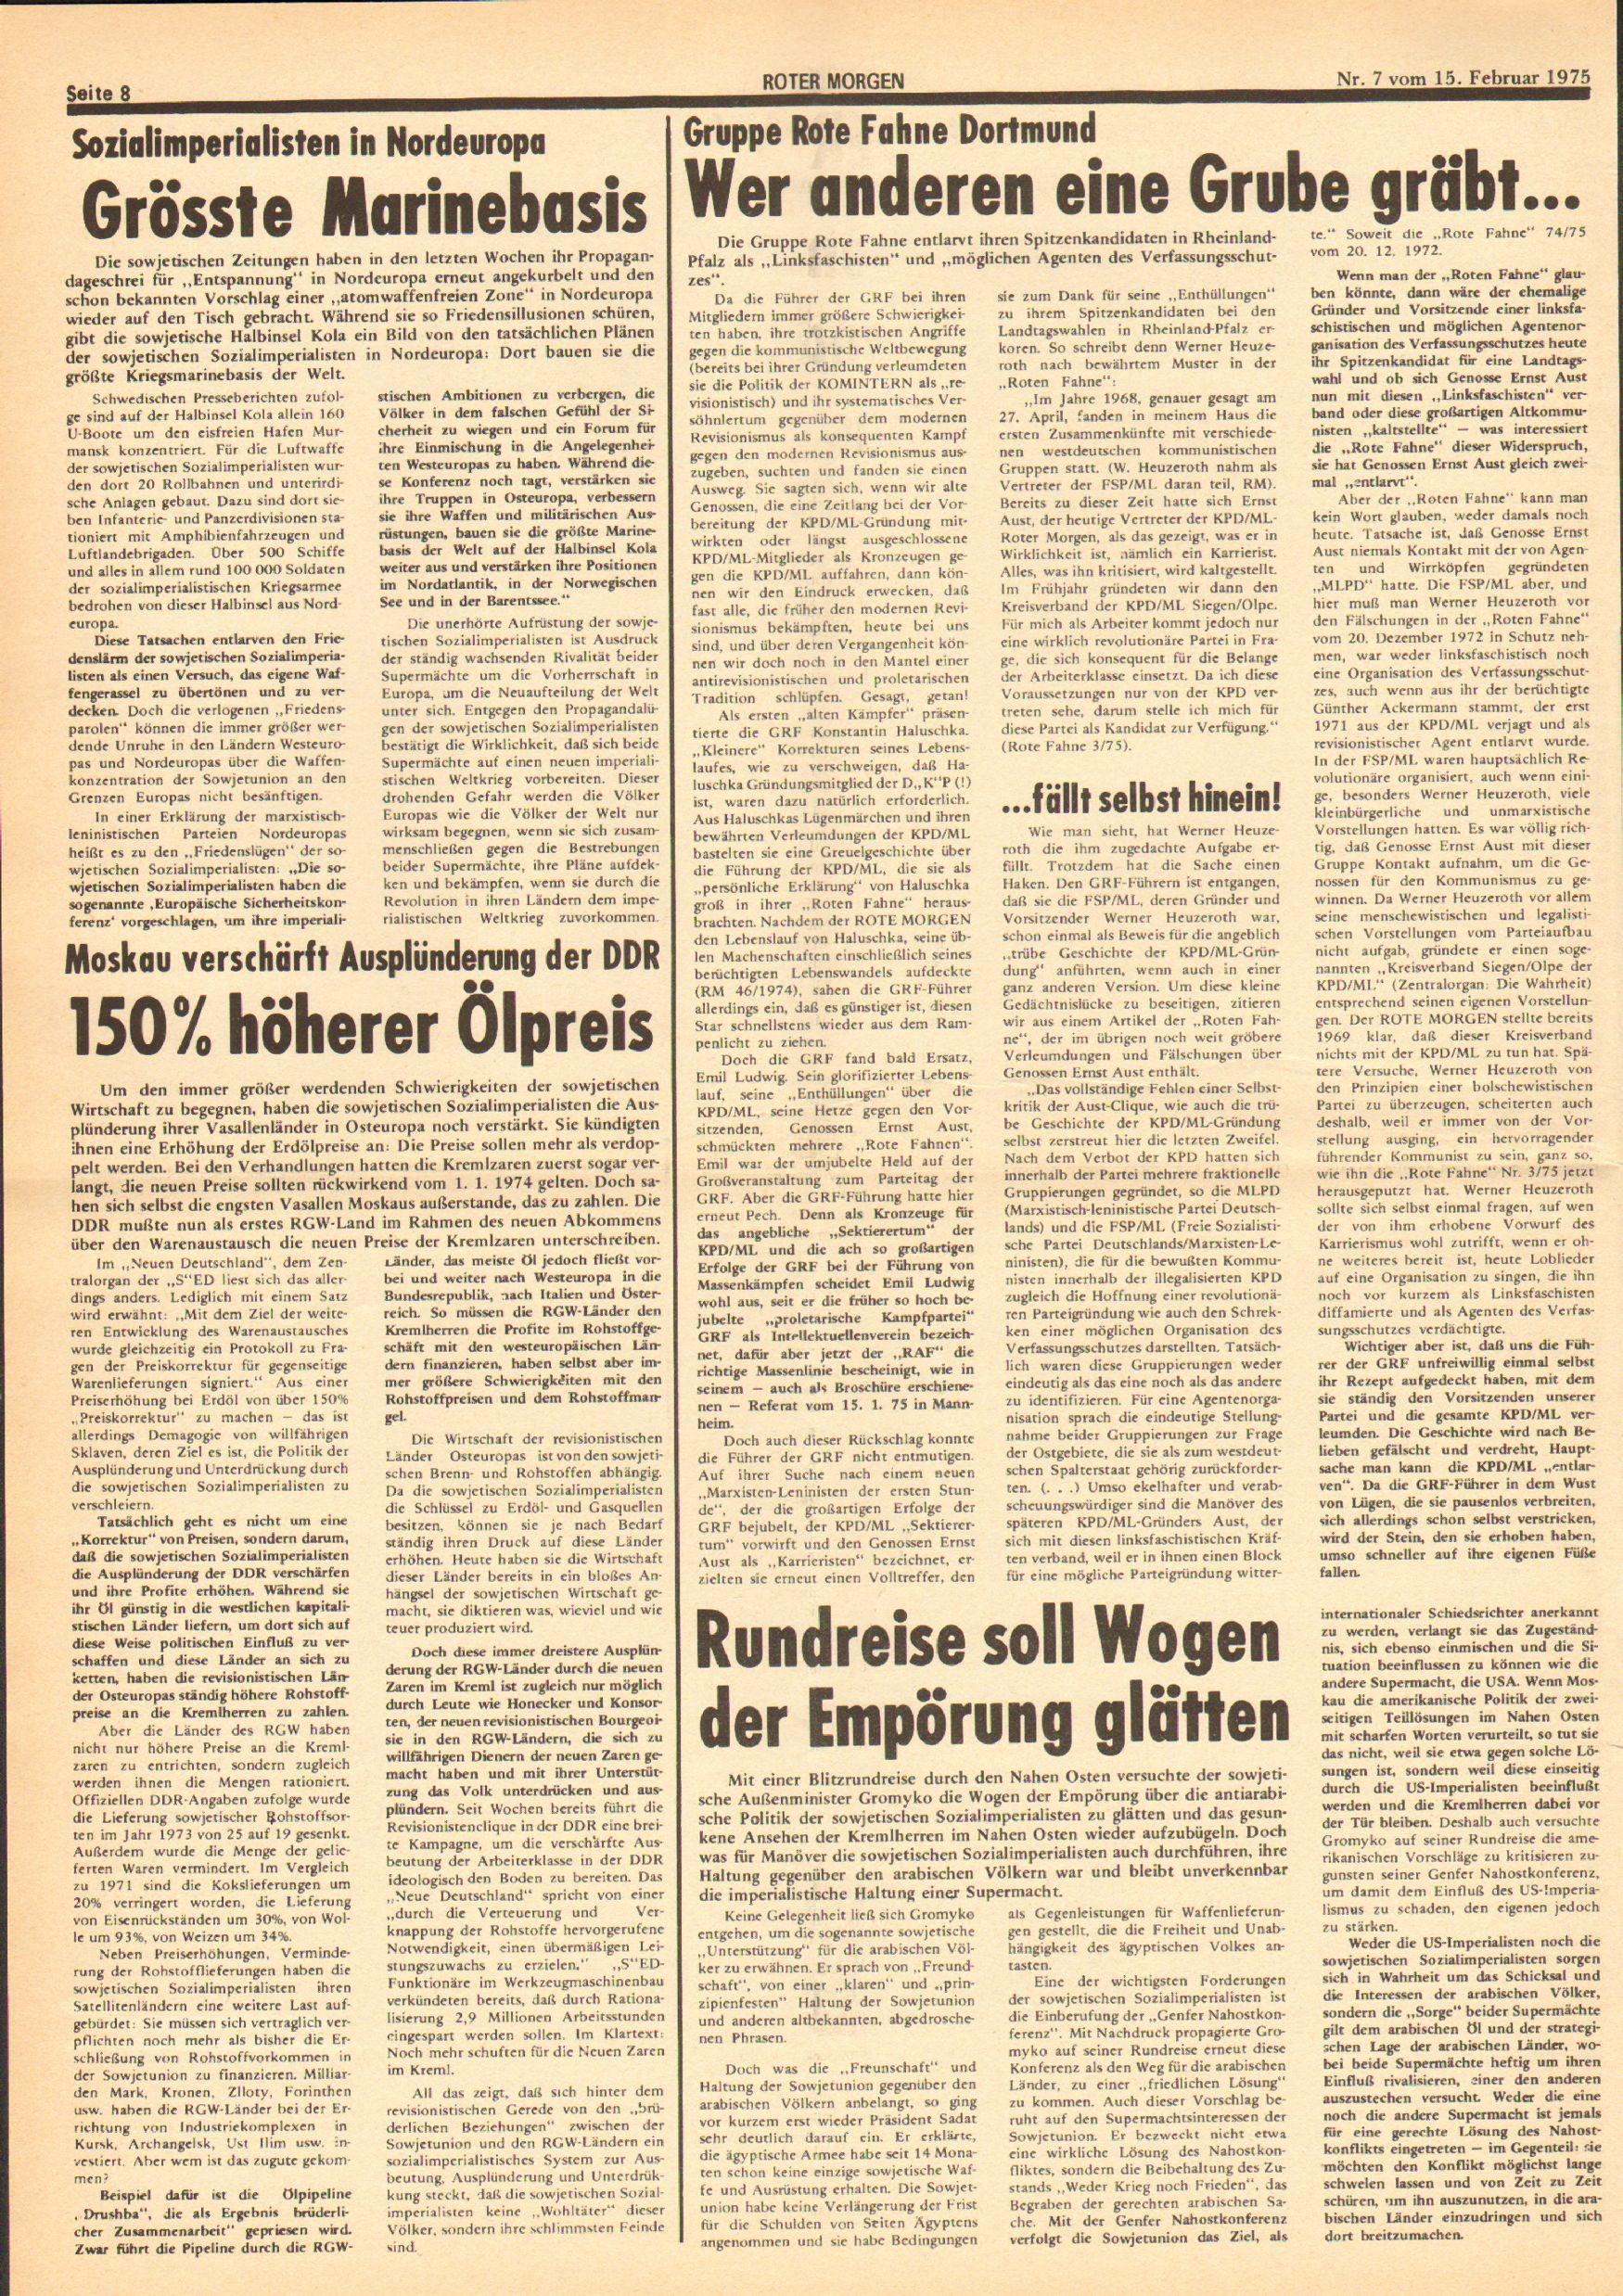 Roter Morgen, 9. Jg., 15. Februar 1975, Nr. 7, Seite 8